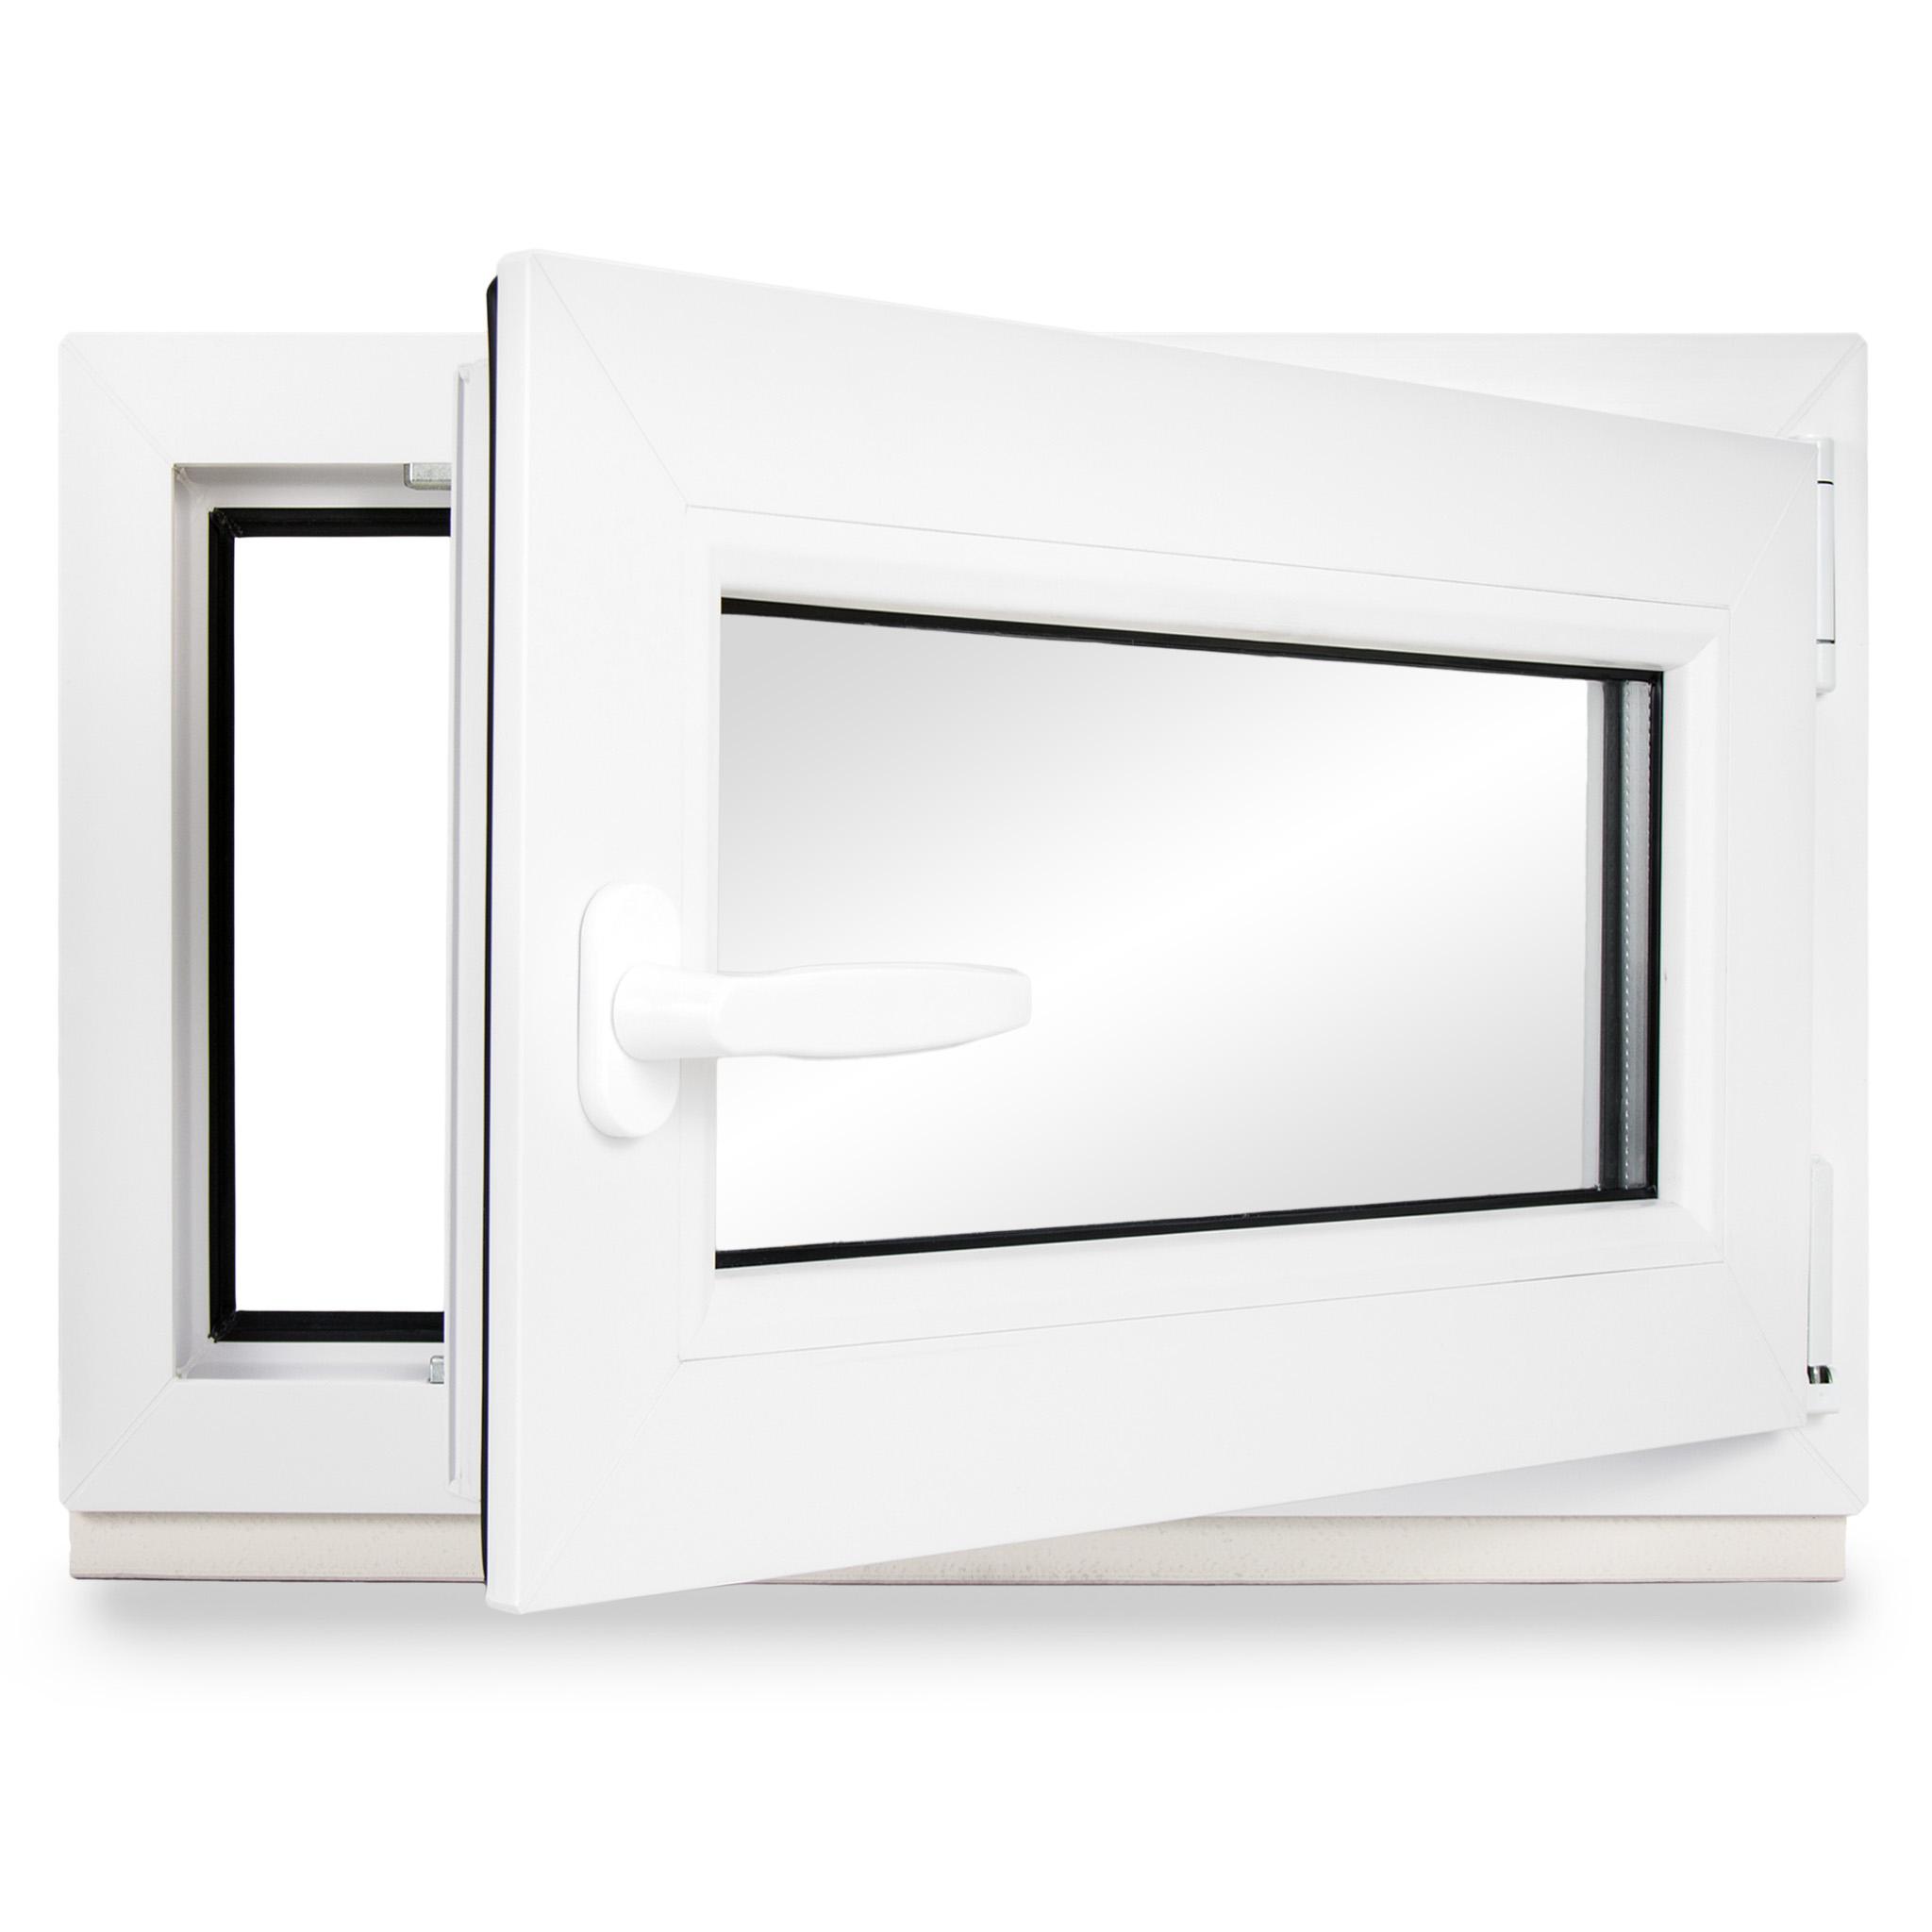 f/ür rechte Fensterfl/ügel | Vierkant 8 mm nach d/änischer Norm | Halbolive gekr/öpft Fenstergriff D/änische Fenster Modell Kopenhagen ZDG-re